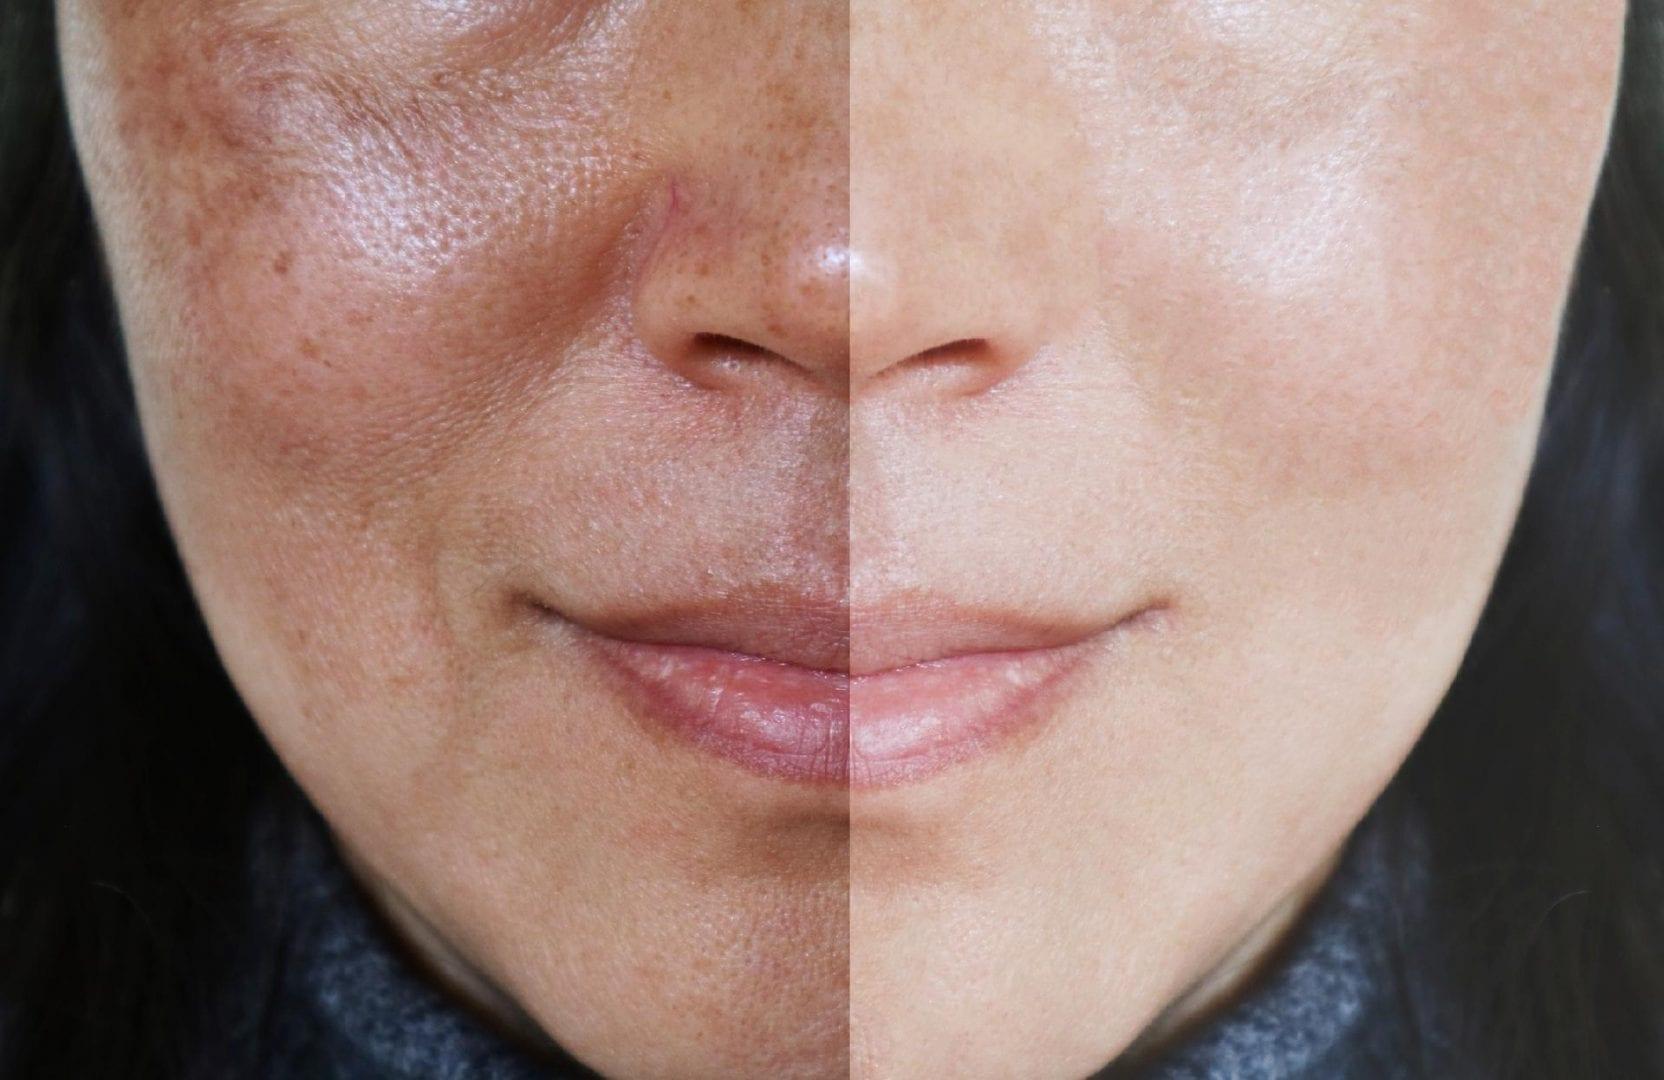 Peeling- O que é, tipos de peeling, cuidados e antes e depois